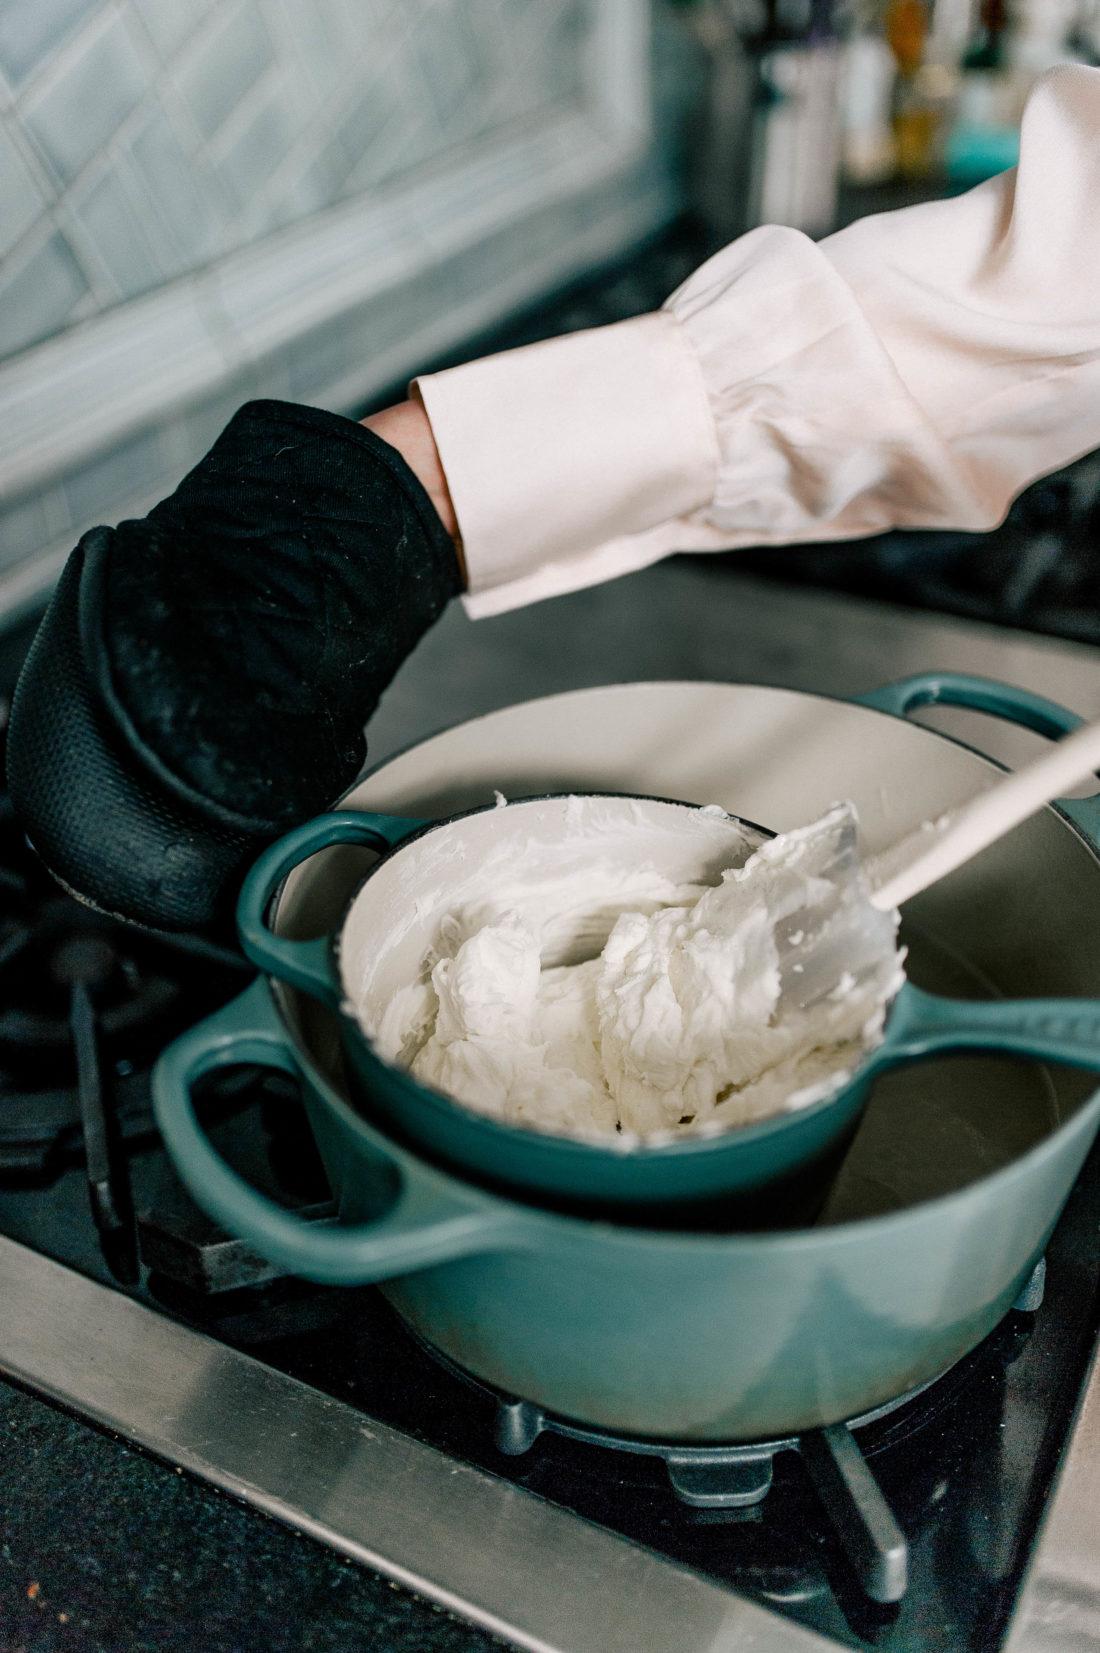 Eva Amurri Martino melts white chocolate to dip pretzels in for Valentine's Day